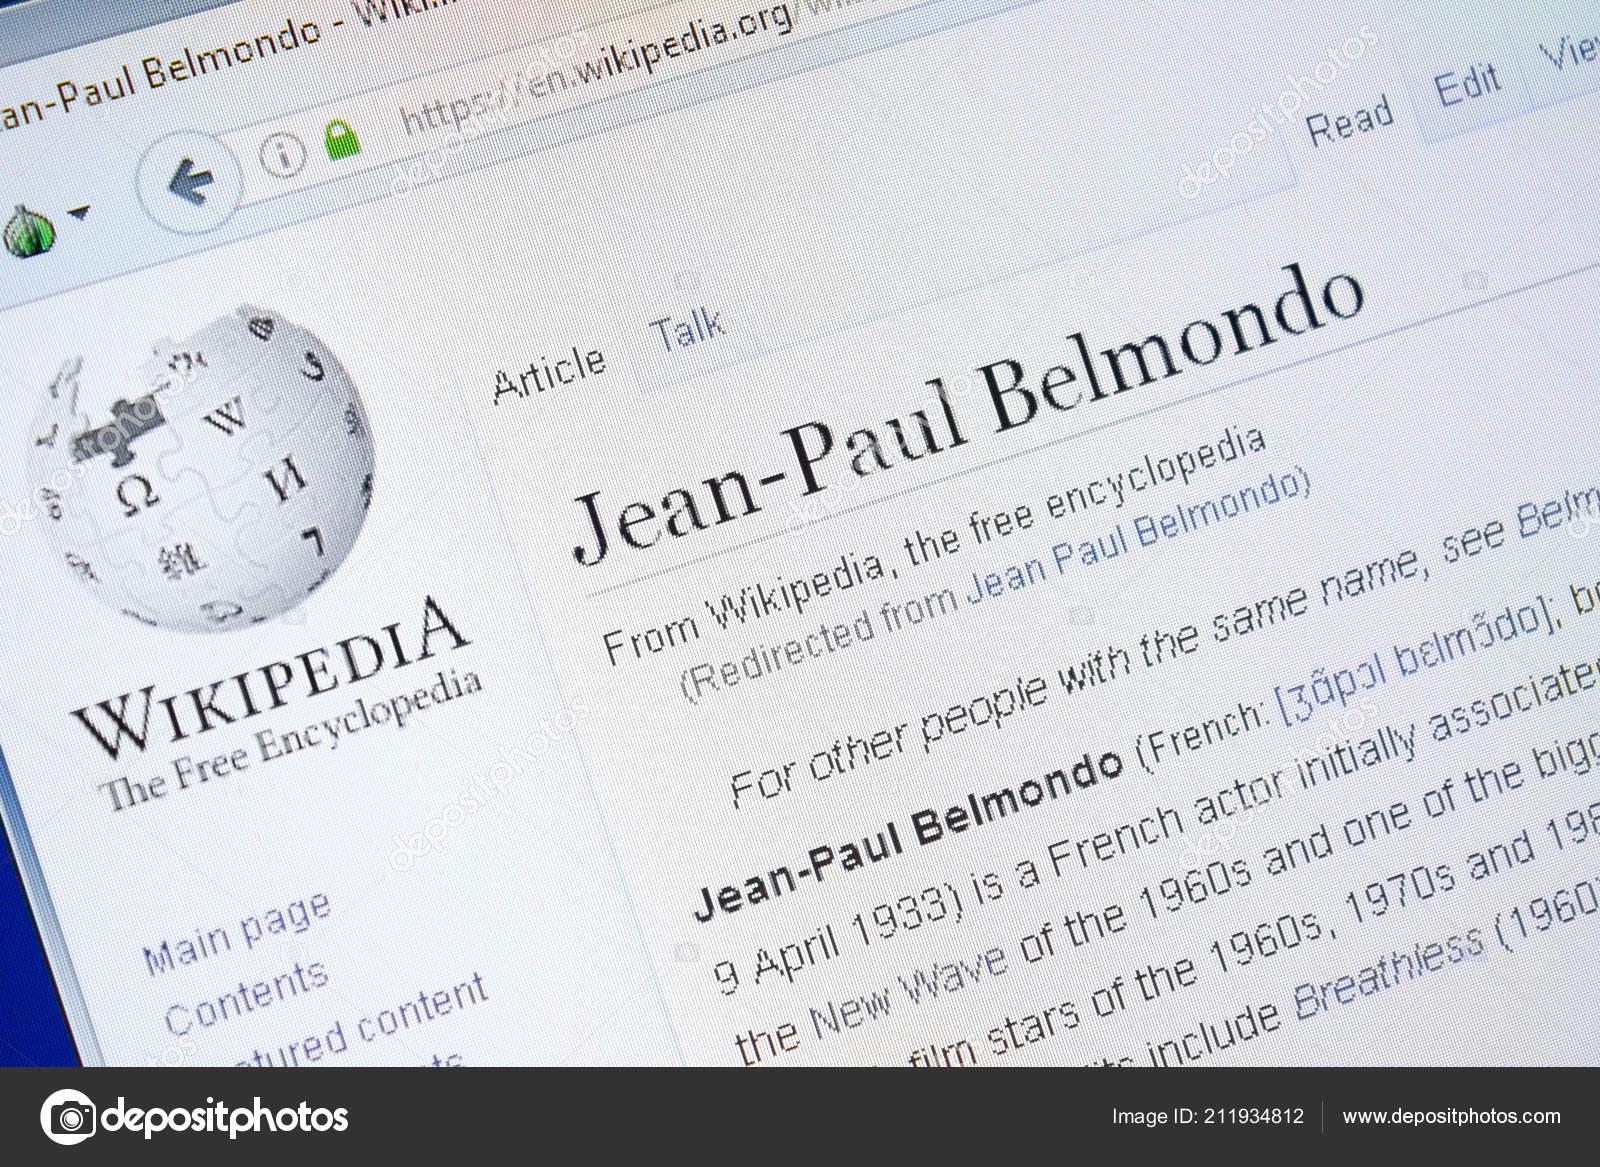 Riazan, en Russie - 28 août 2018 : La page Wikipedia sur